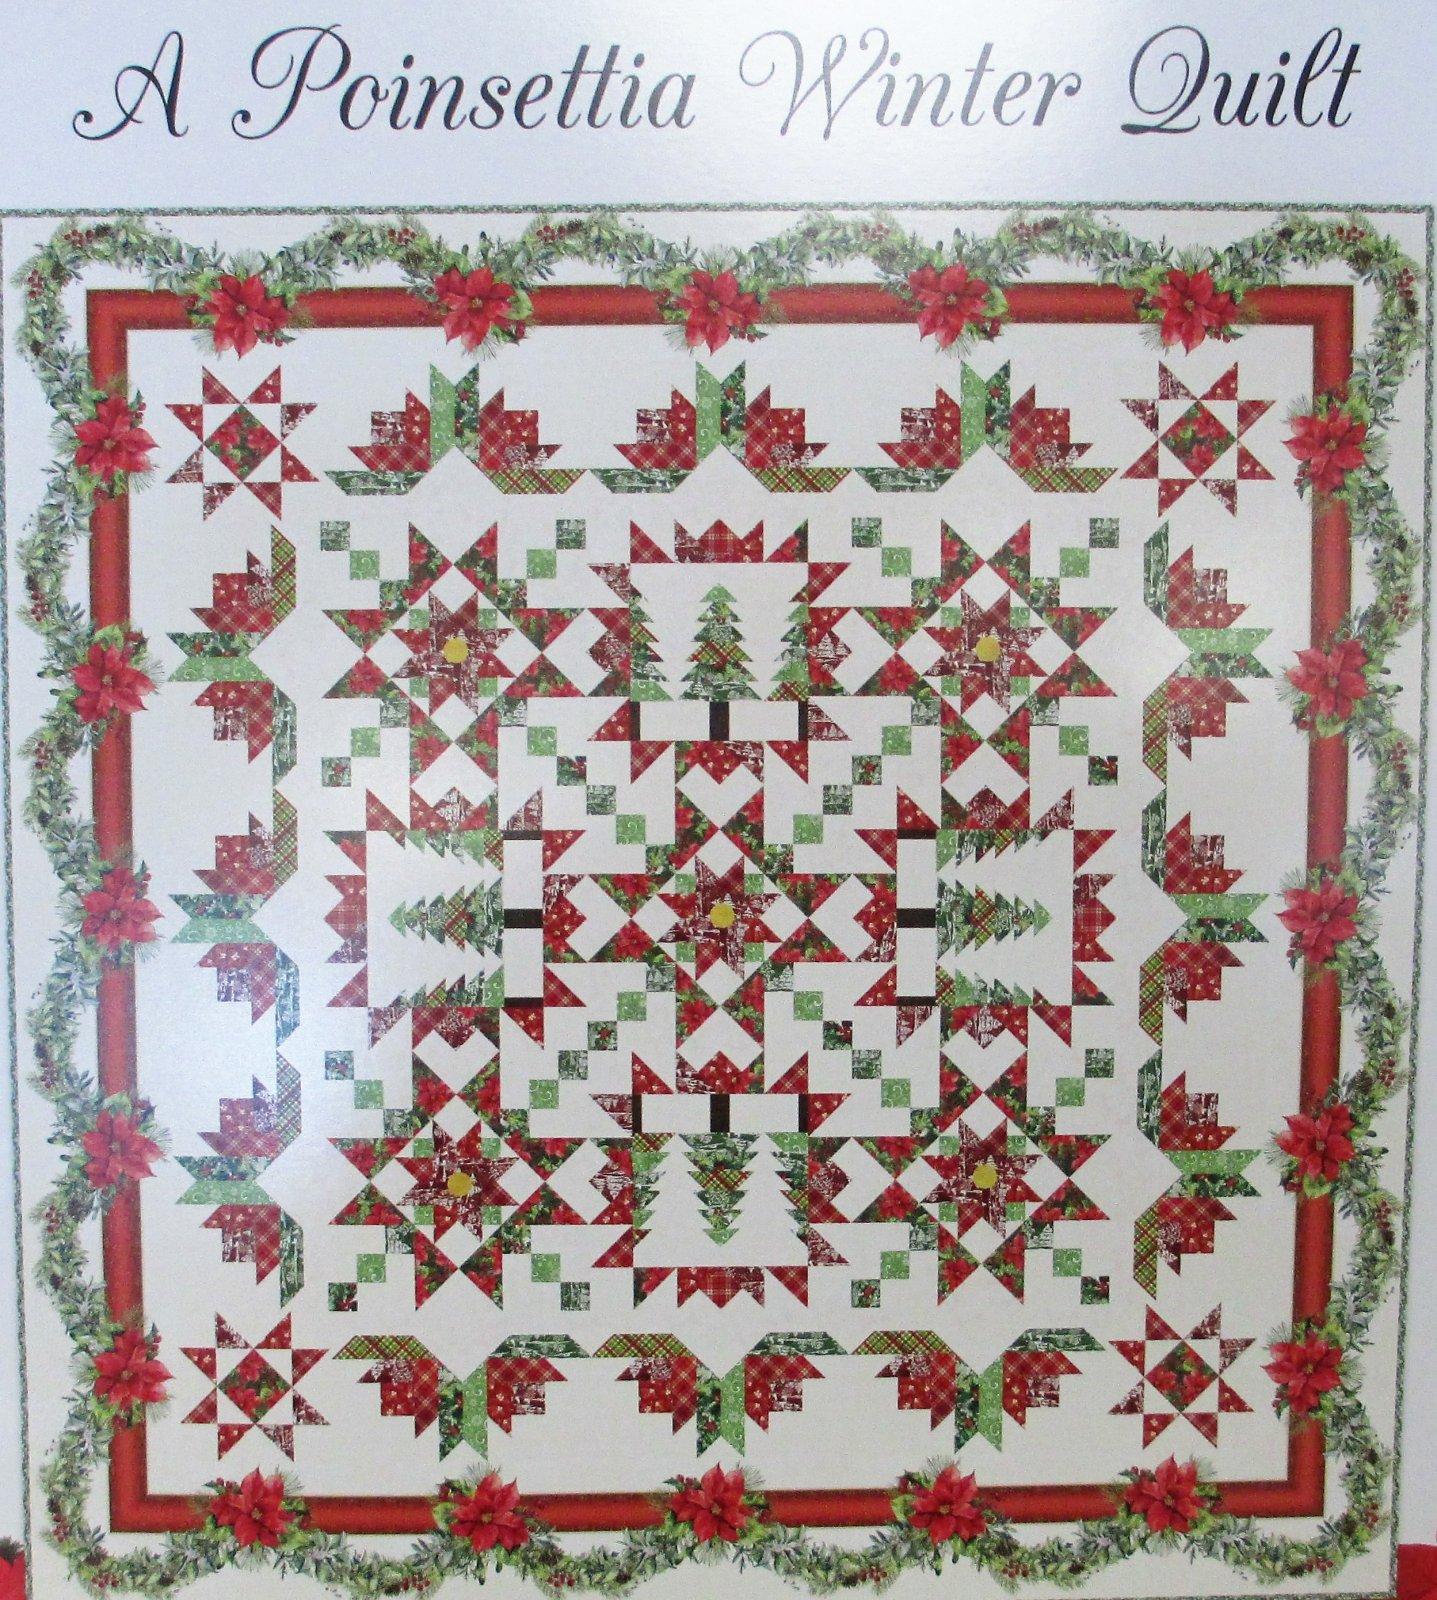 Poinsettia Winter - 50.00